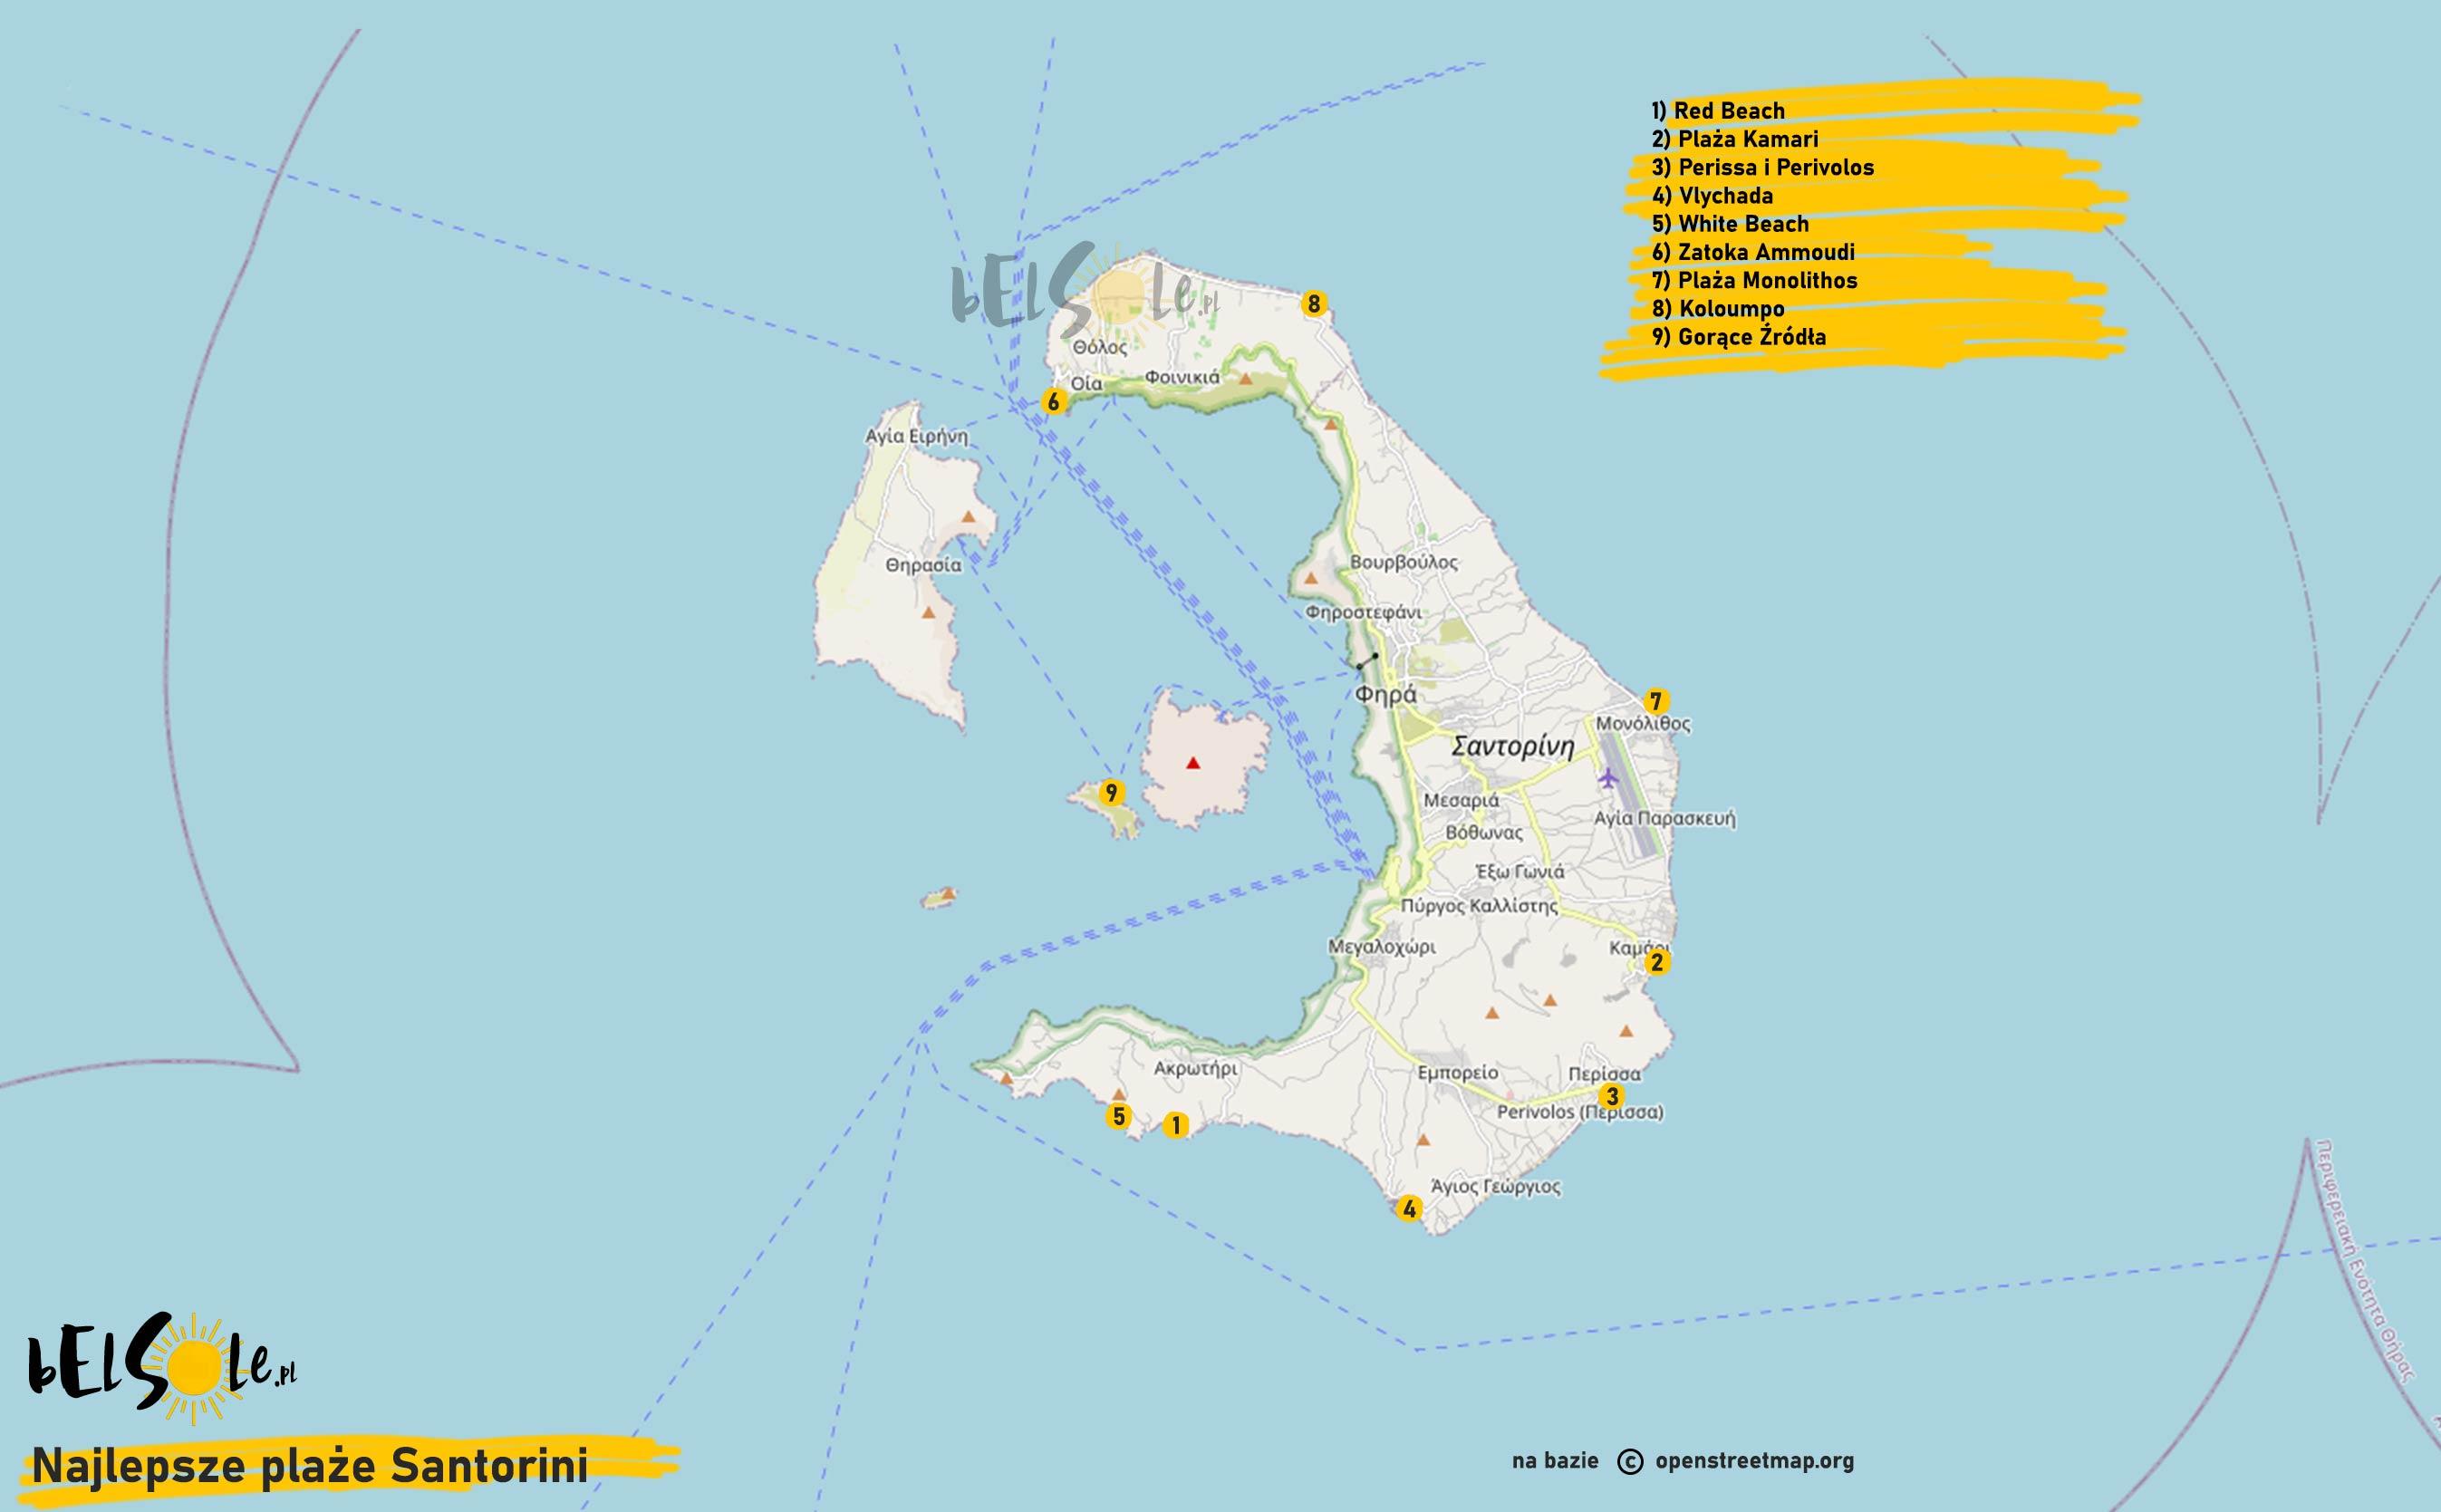 najlepsze plaże na Santorini